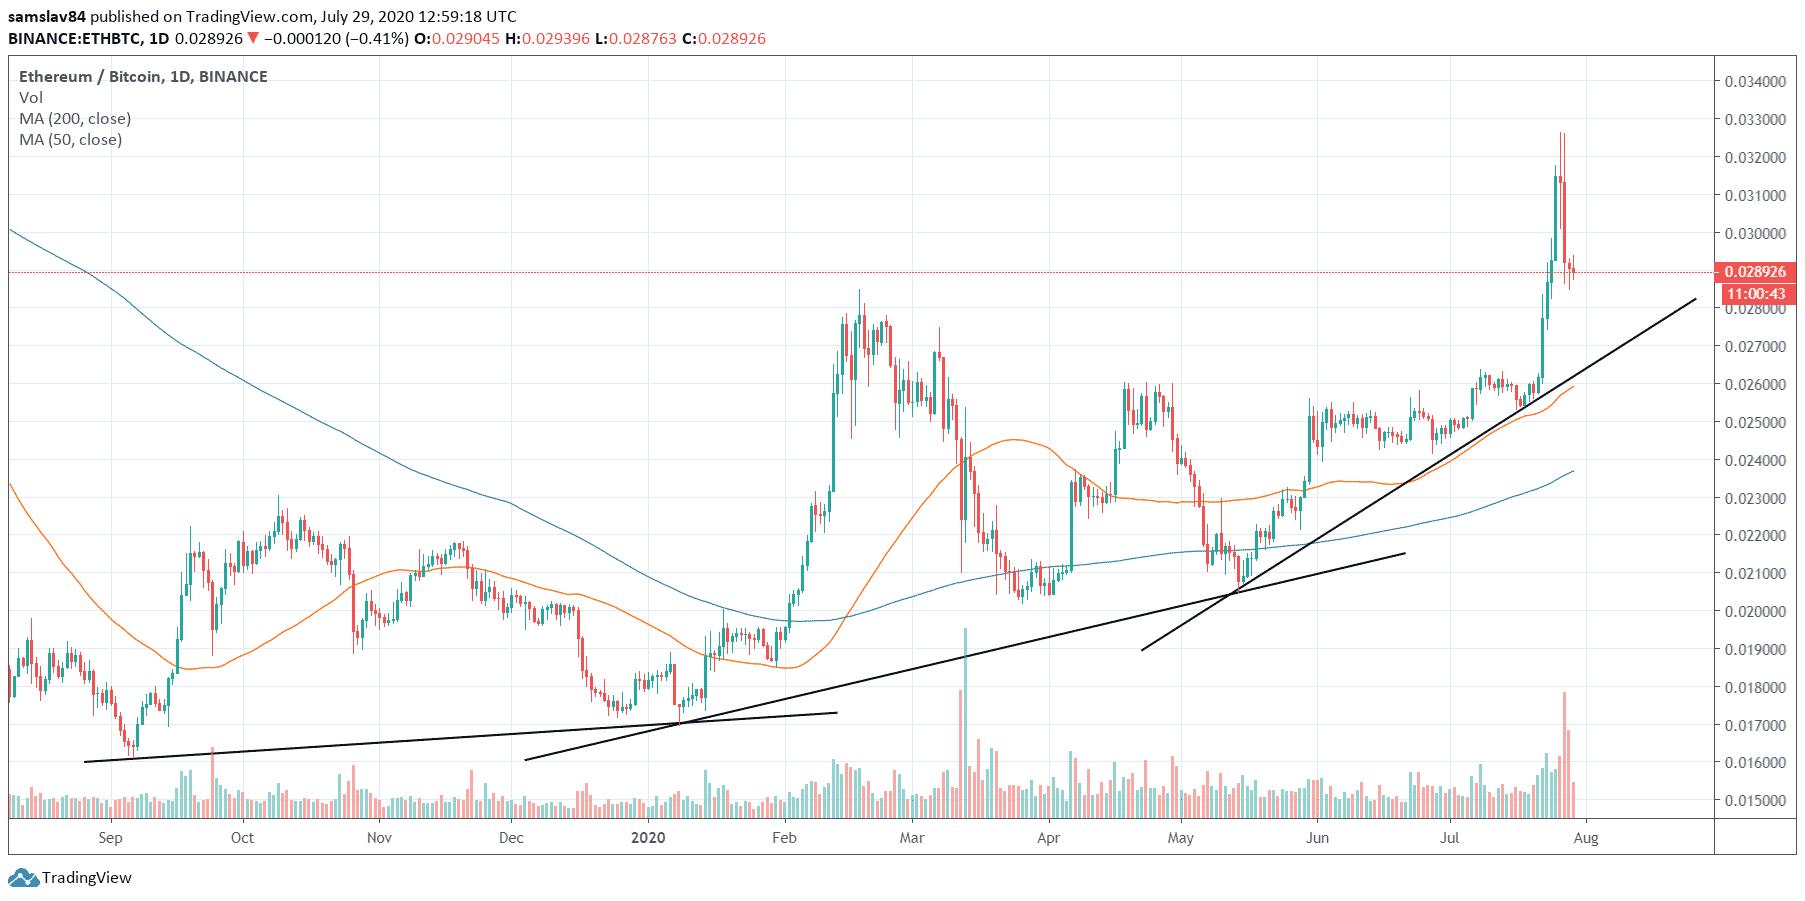 eth/btc parabola